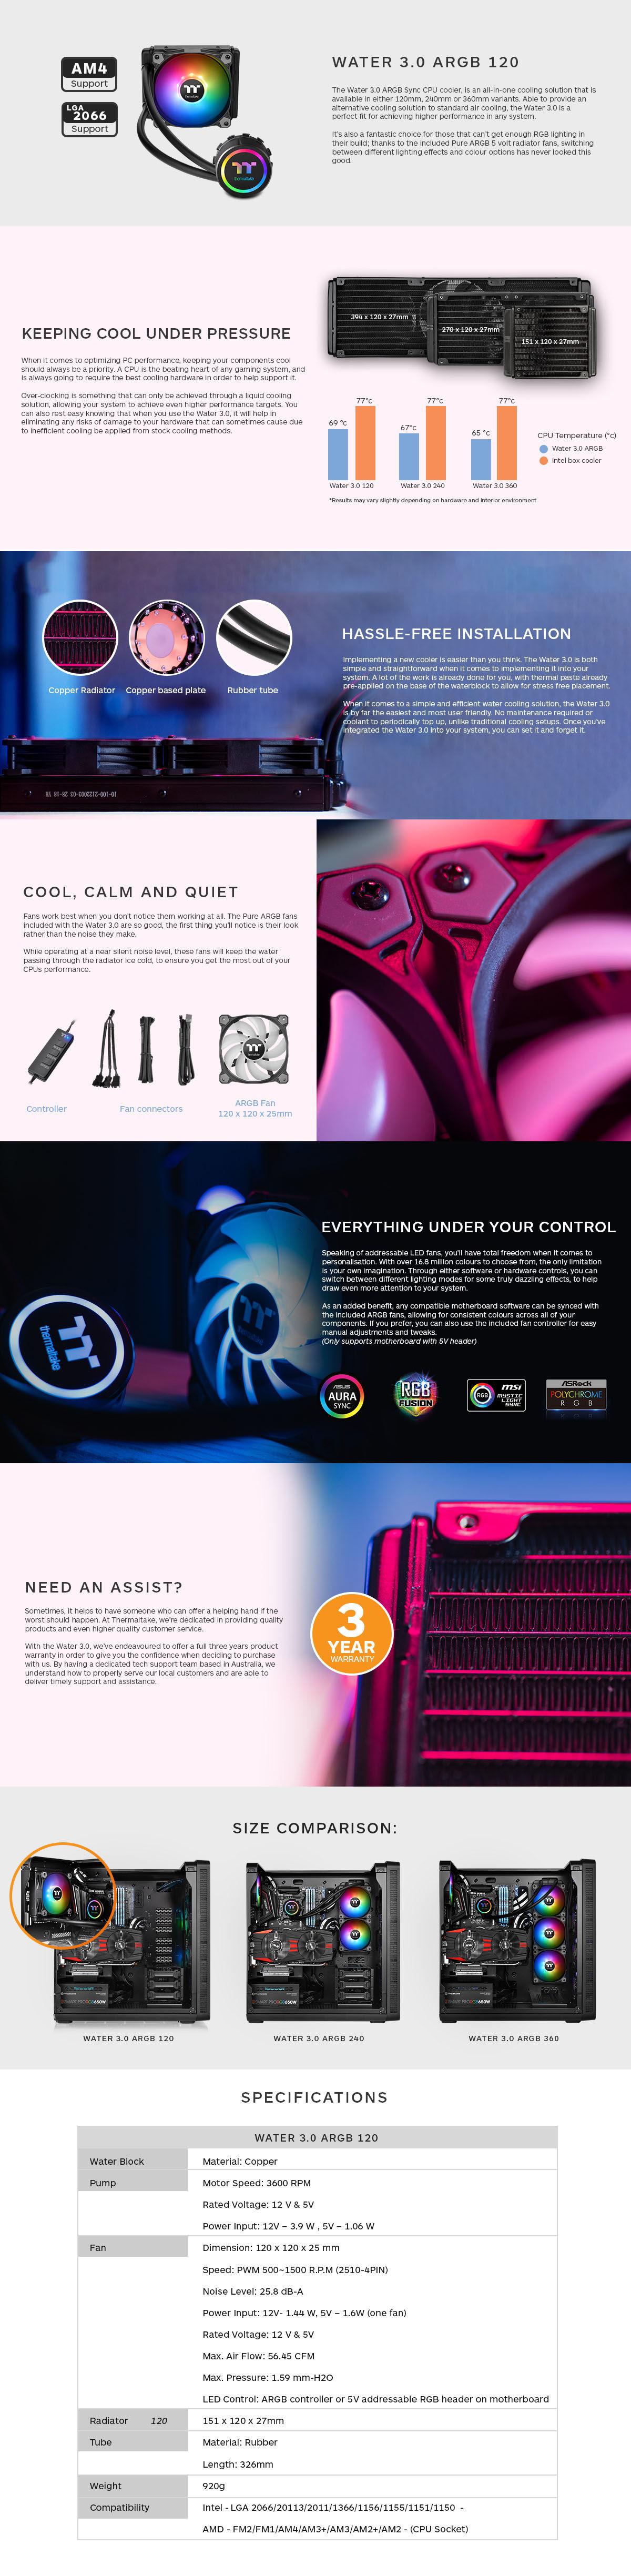 Thermaltake Water 3.0 120 ARGB Sync Edition AIO Liquid CPU Cooler